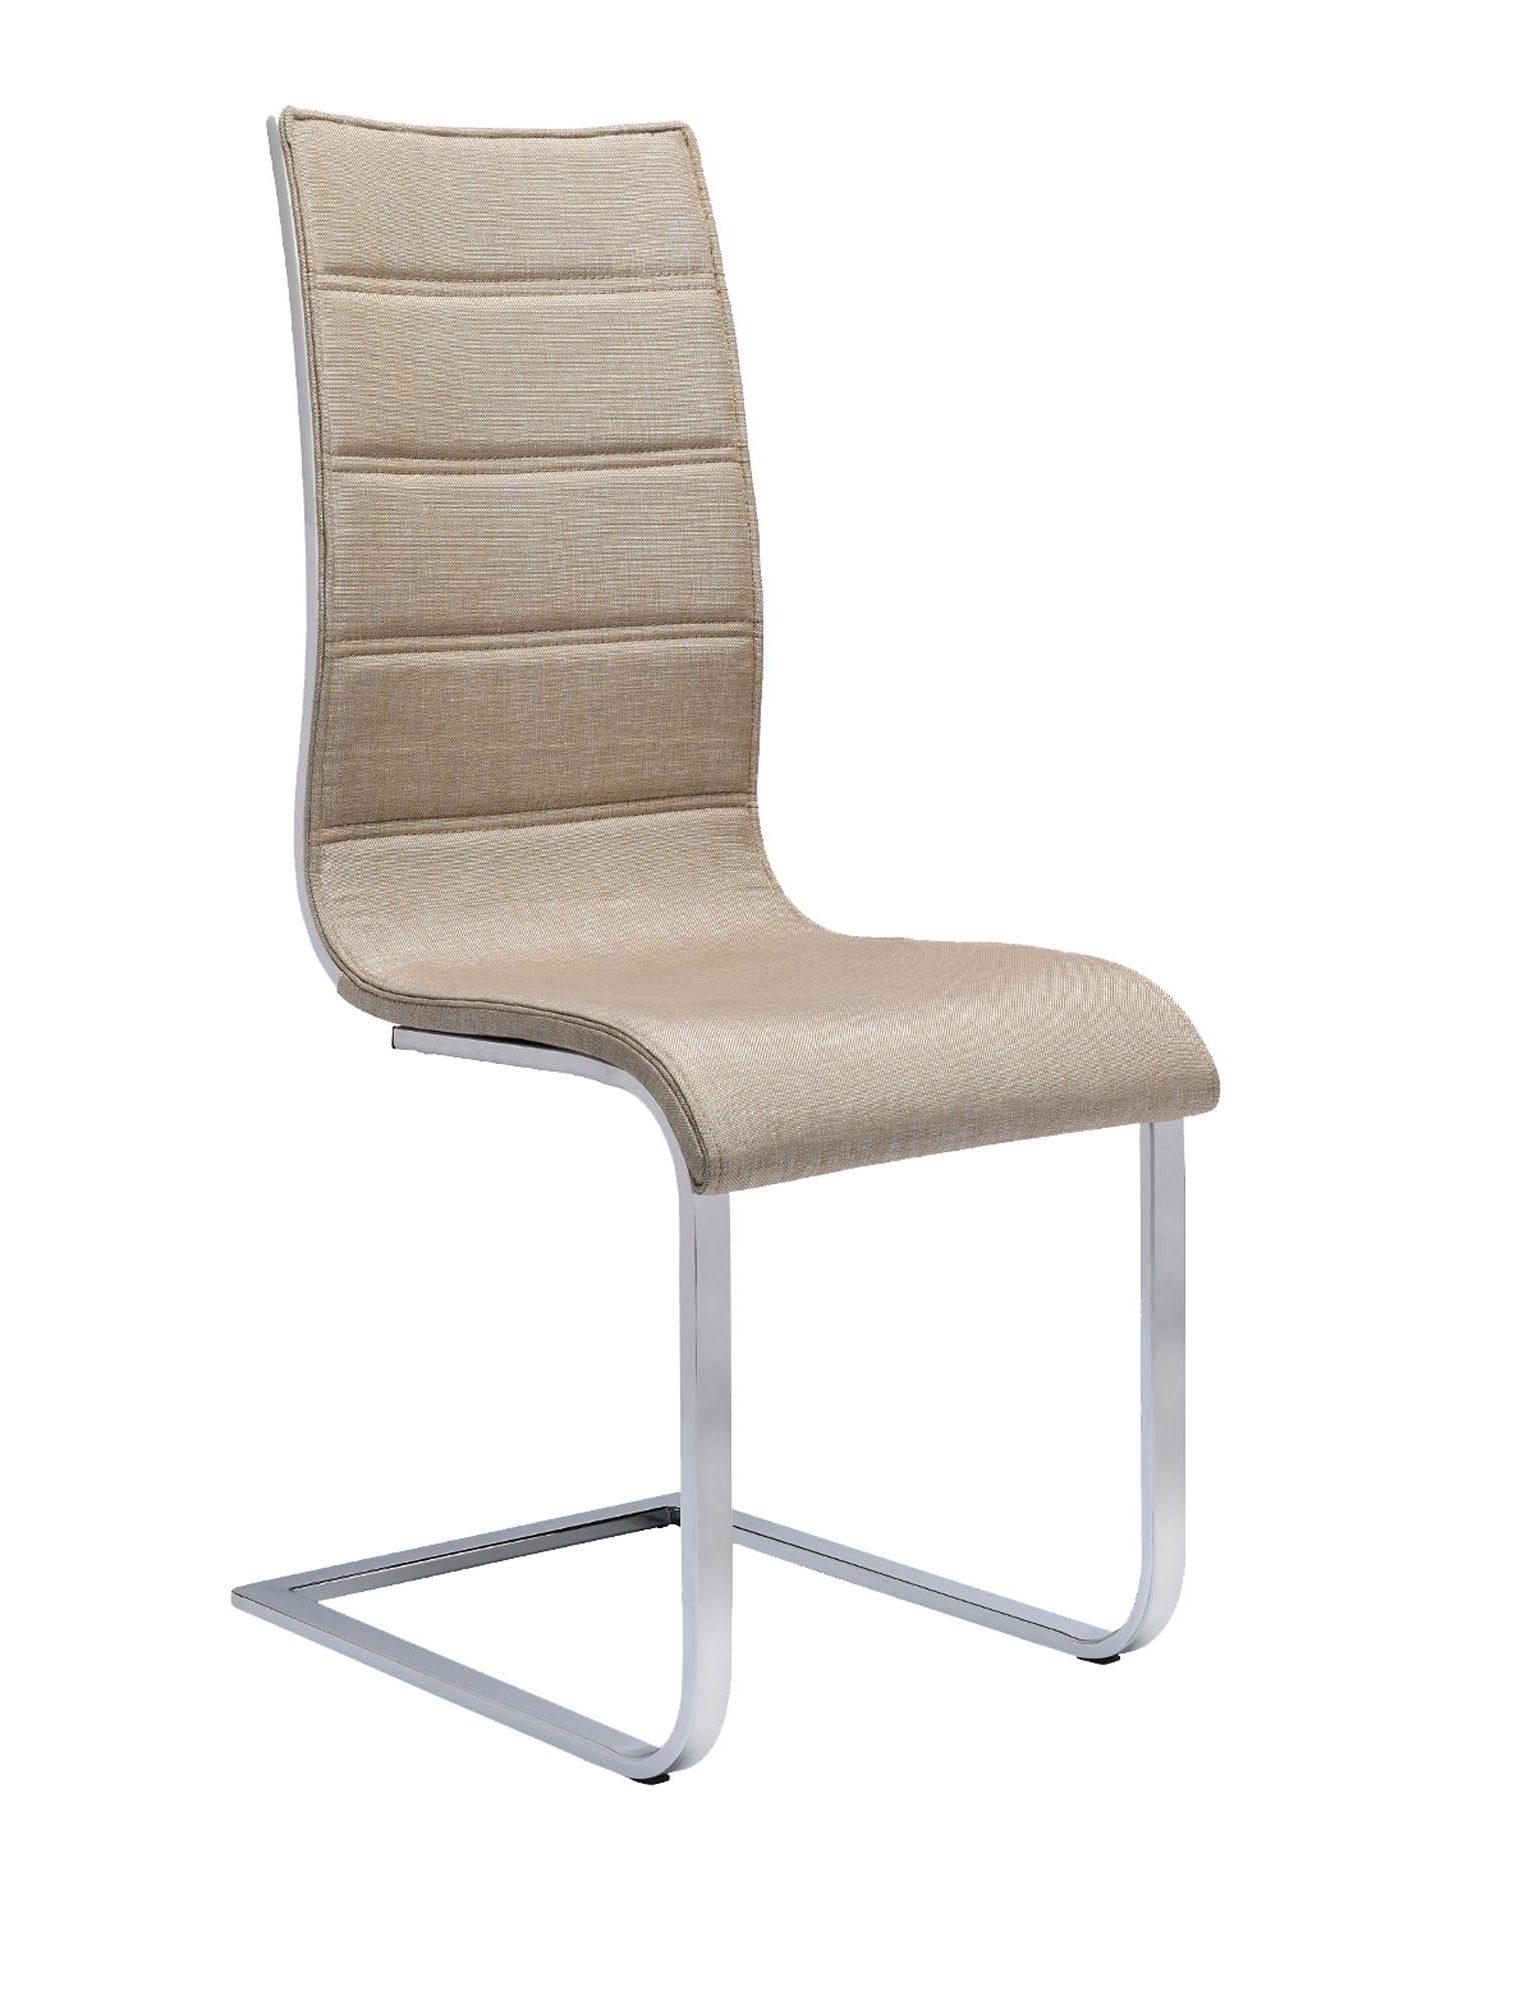 Scaun tapitat cu stofa, cu picioare metalice K104 Beige / White, l42xA56xH99 cm somproduct.ro